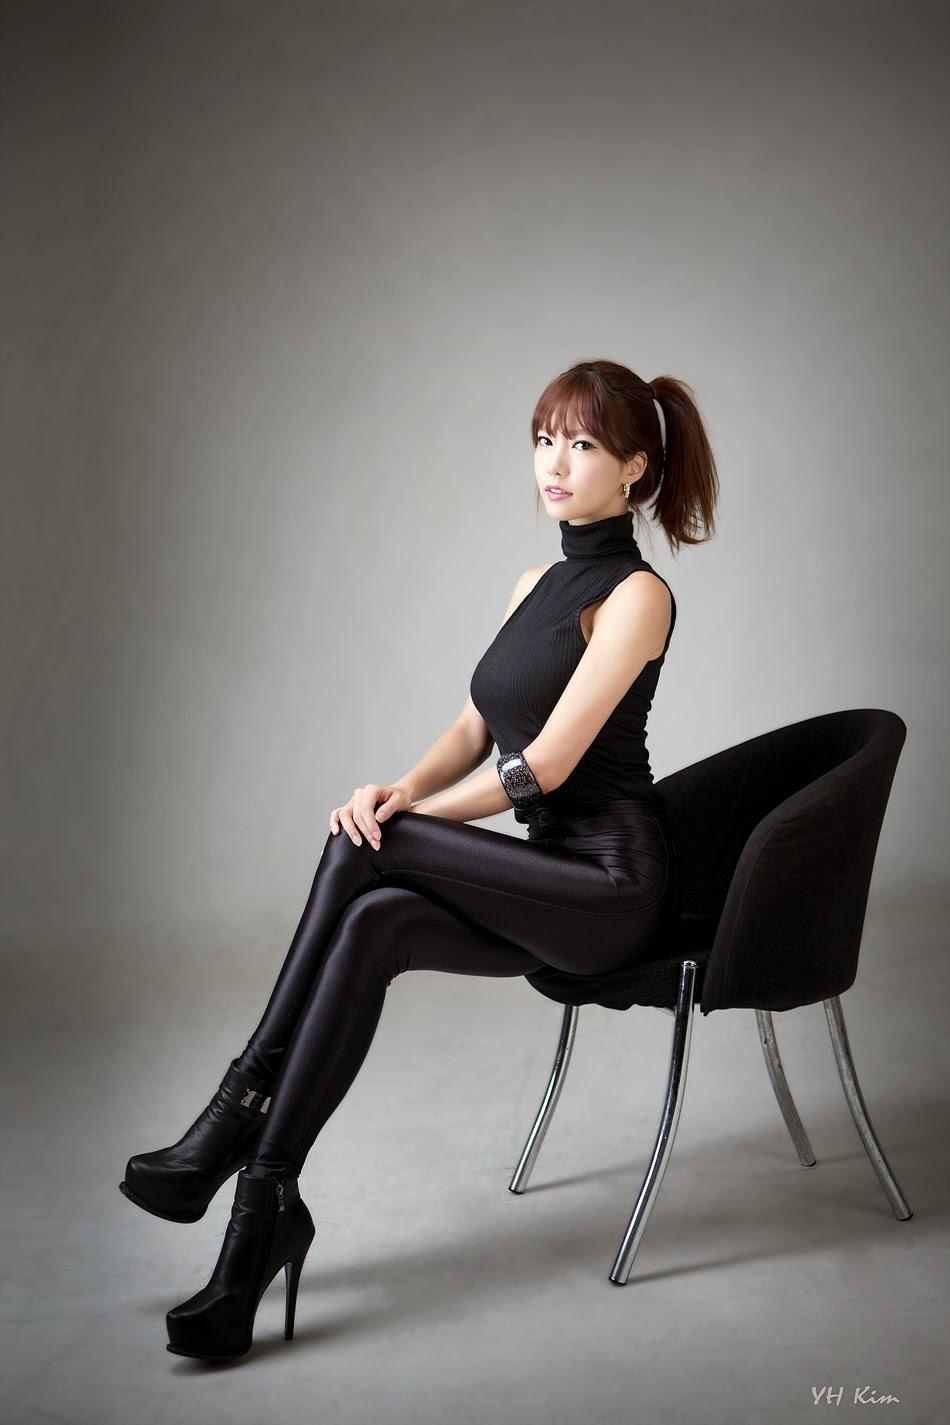 2 Han Min Young - Black lady - very cute asian girl-girlcute4u.blogspot.com